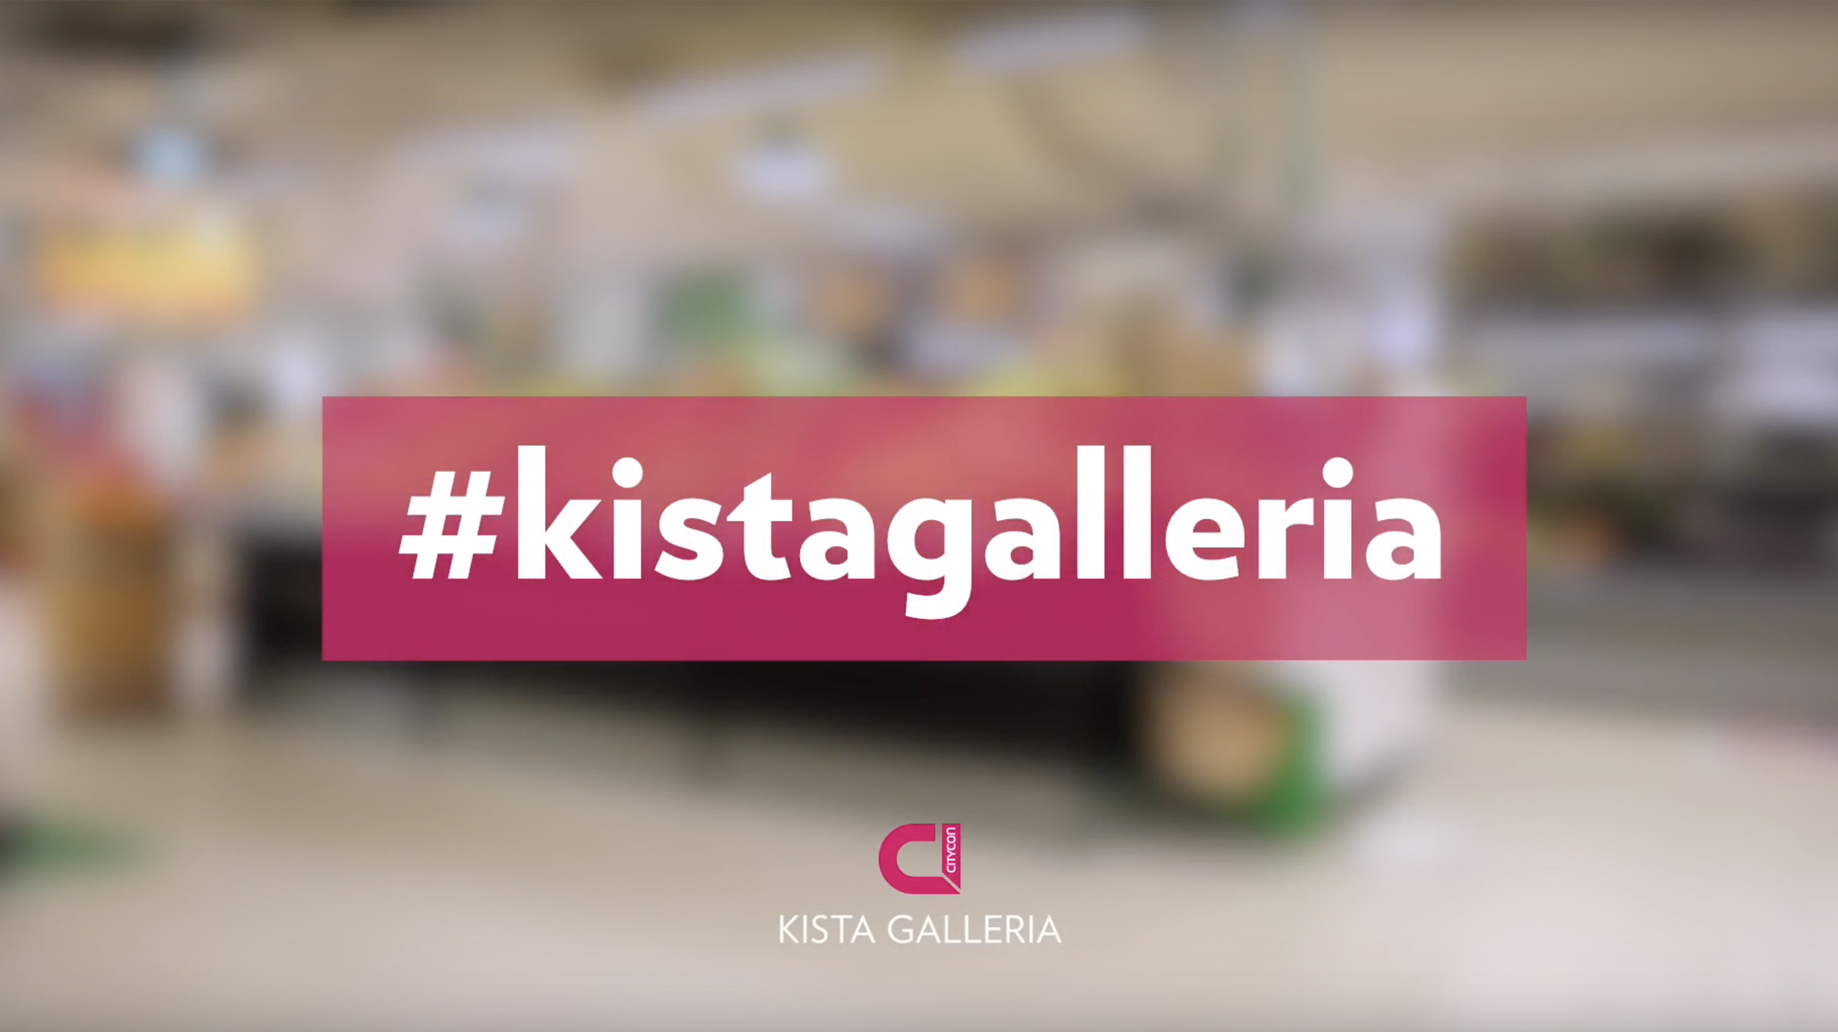 KISTA GALLERIA/CITYCON